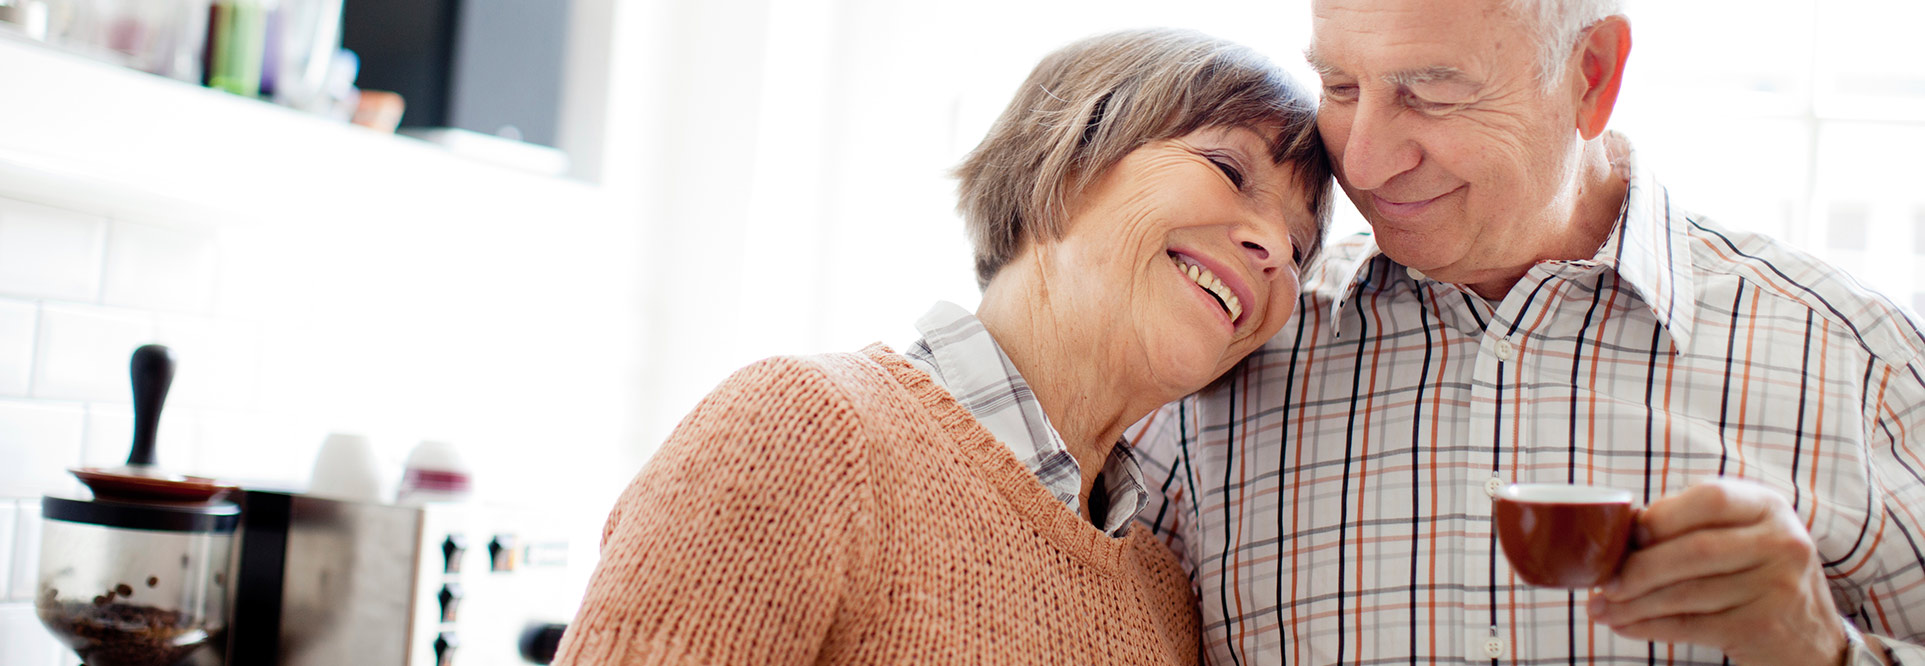 Image result for loving relationship